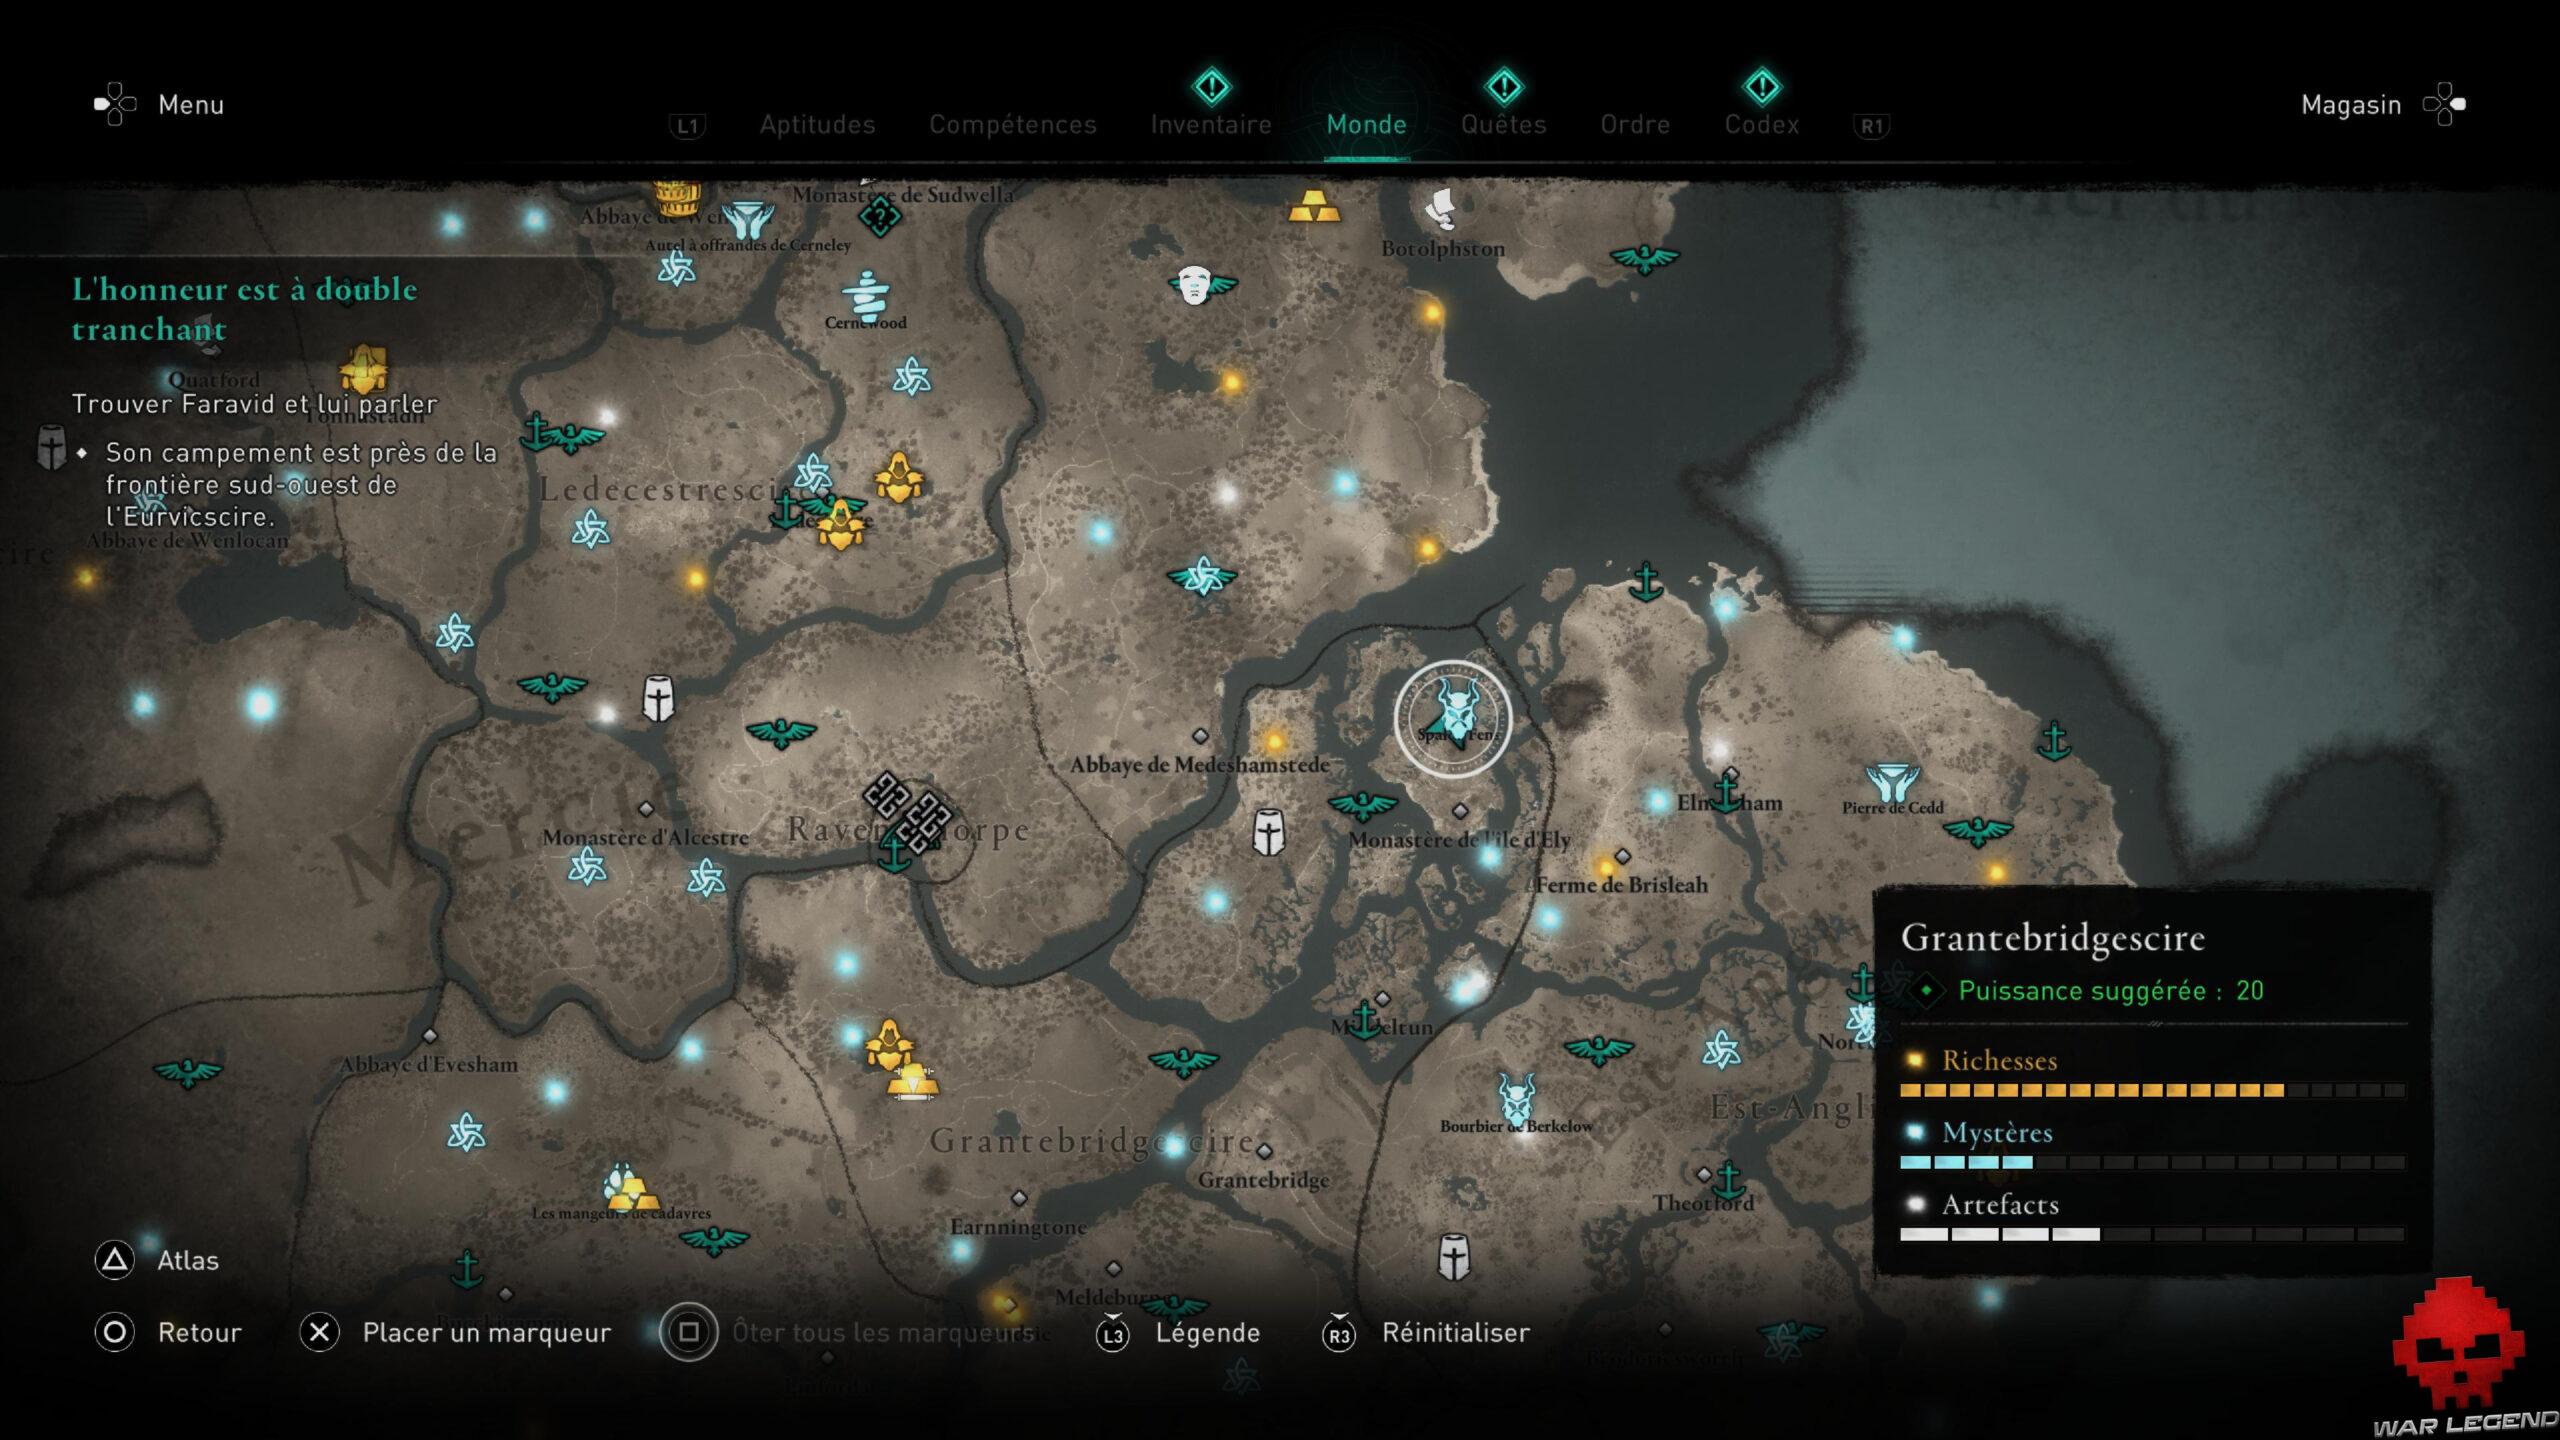 Carte Grantebridgescire Assassin's Creed Valhalla